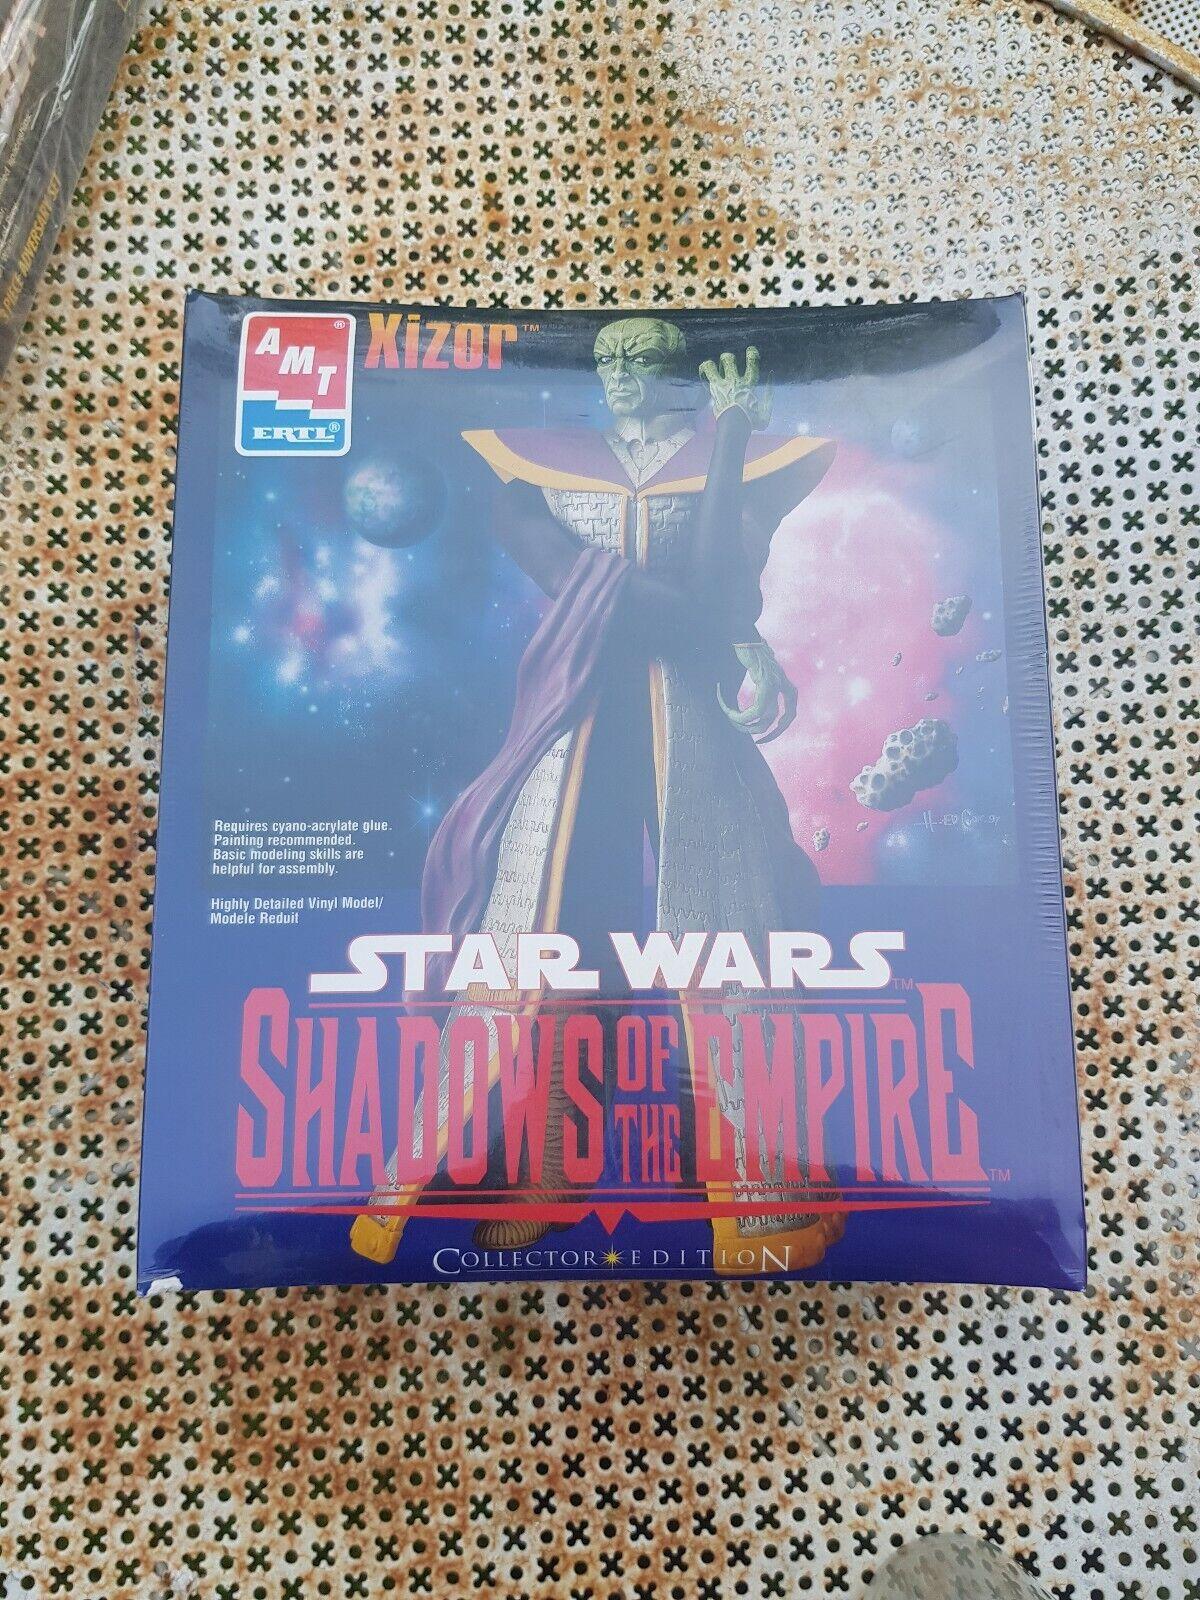 AMT ERTL STAR WARS SHADOWS OF THE EMPIRE collector edition